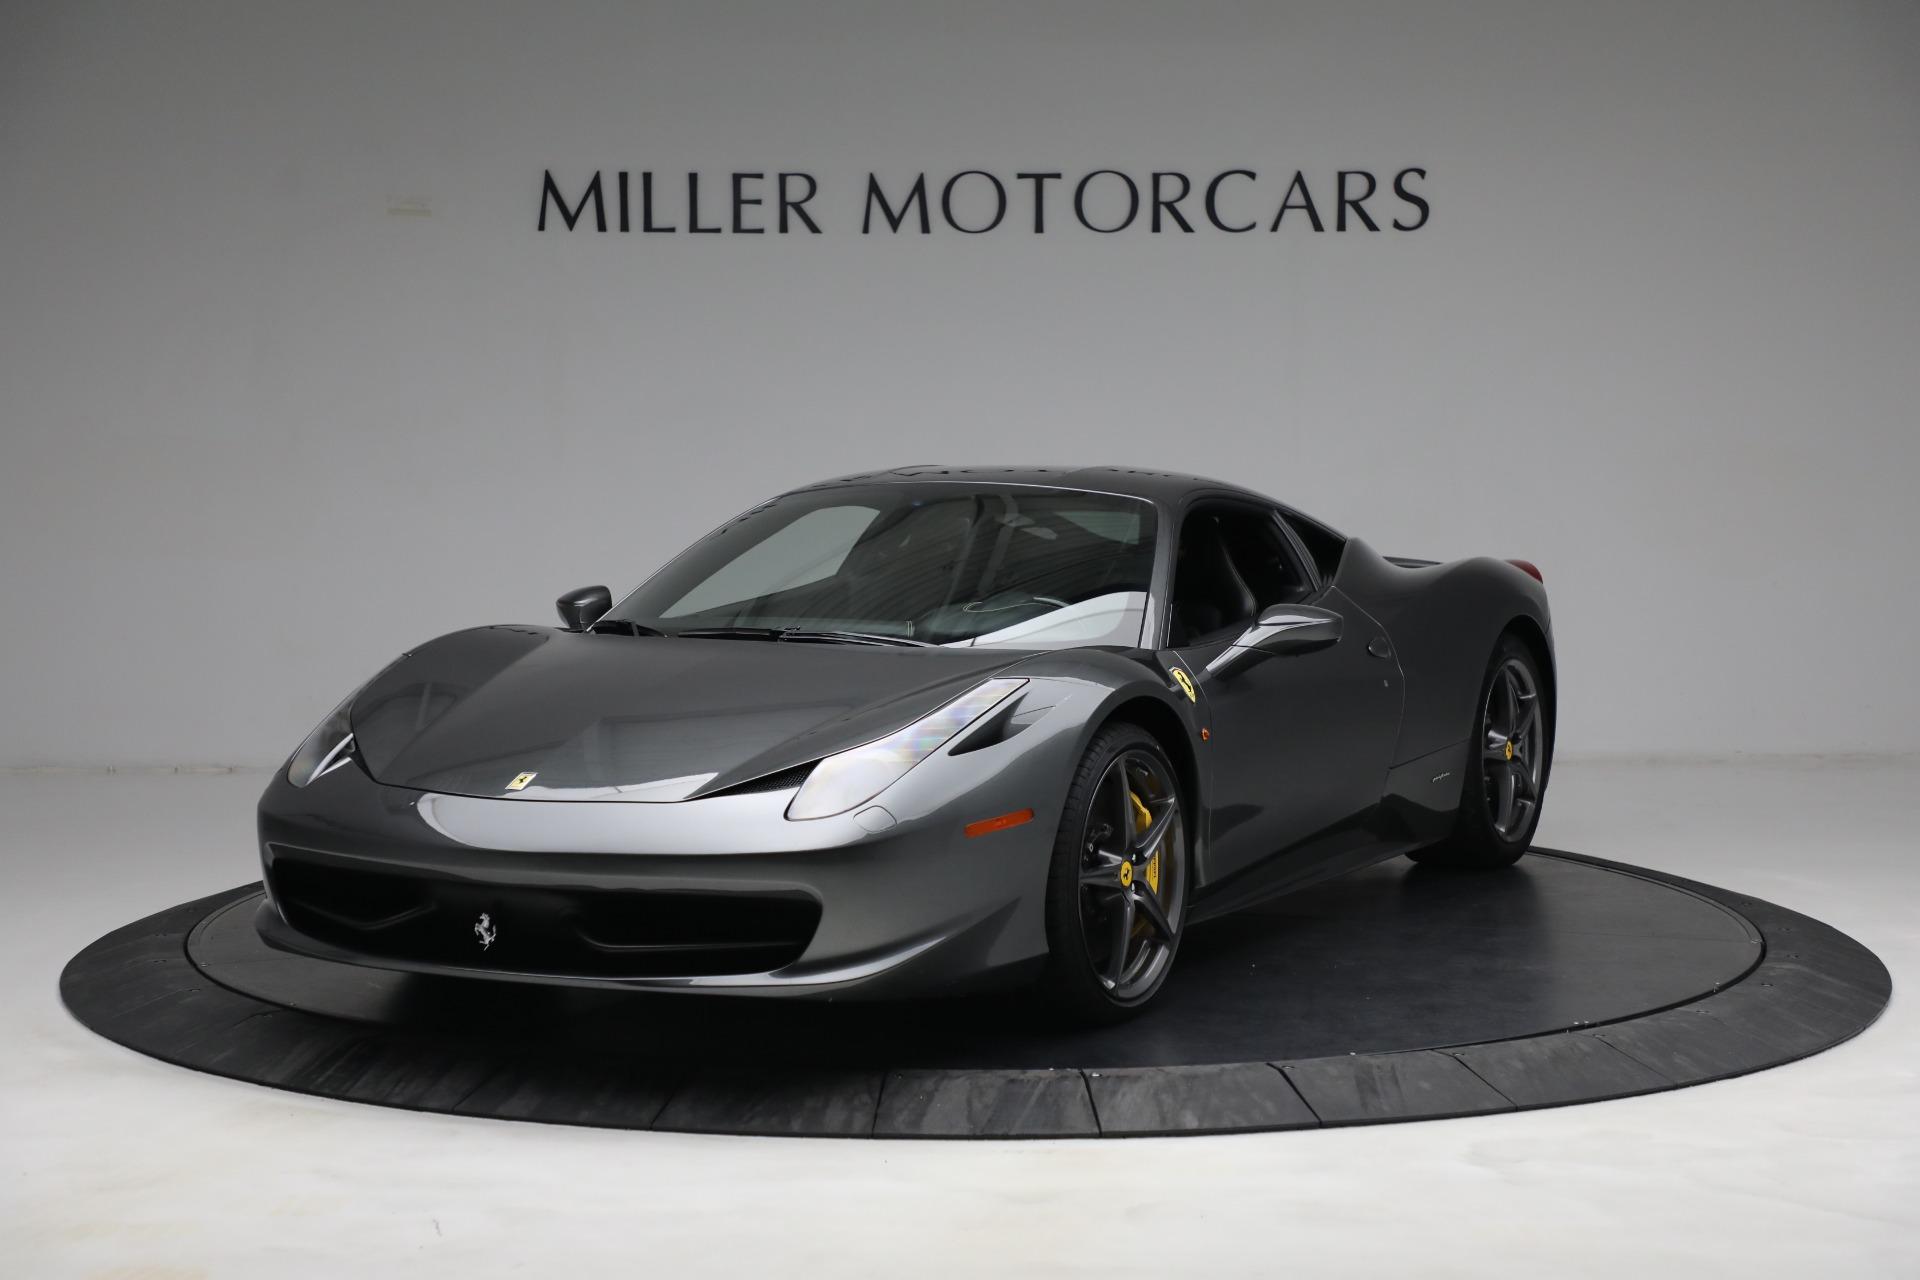 Used 2011 Ferrari 458 Italia for sale $229,900 at McLaren Greenwich in Greenwich CT 06830 1